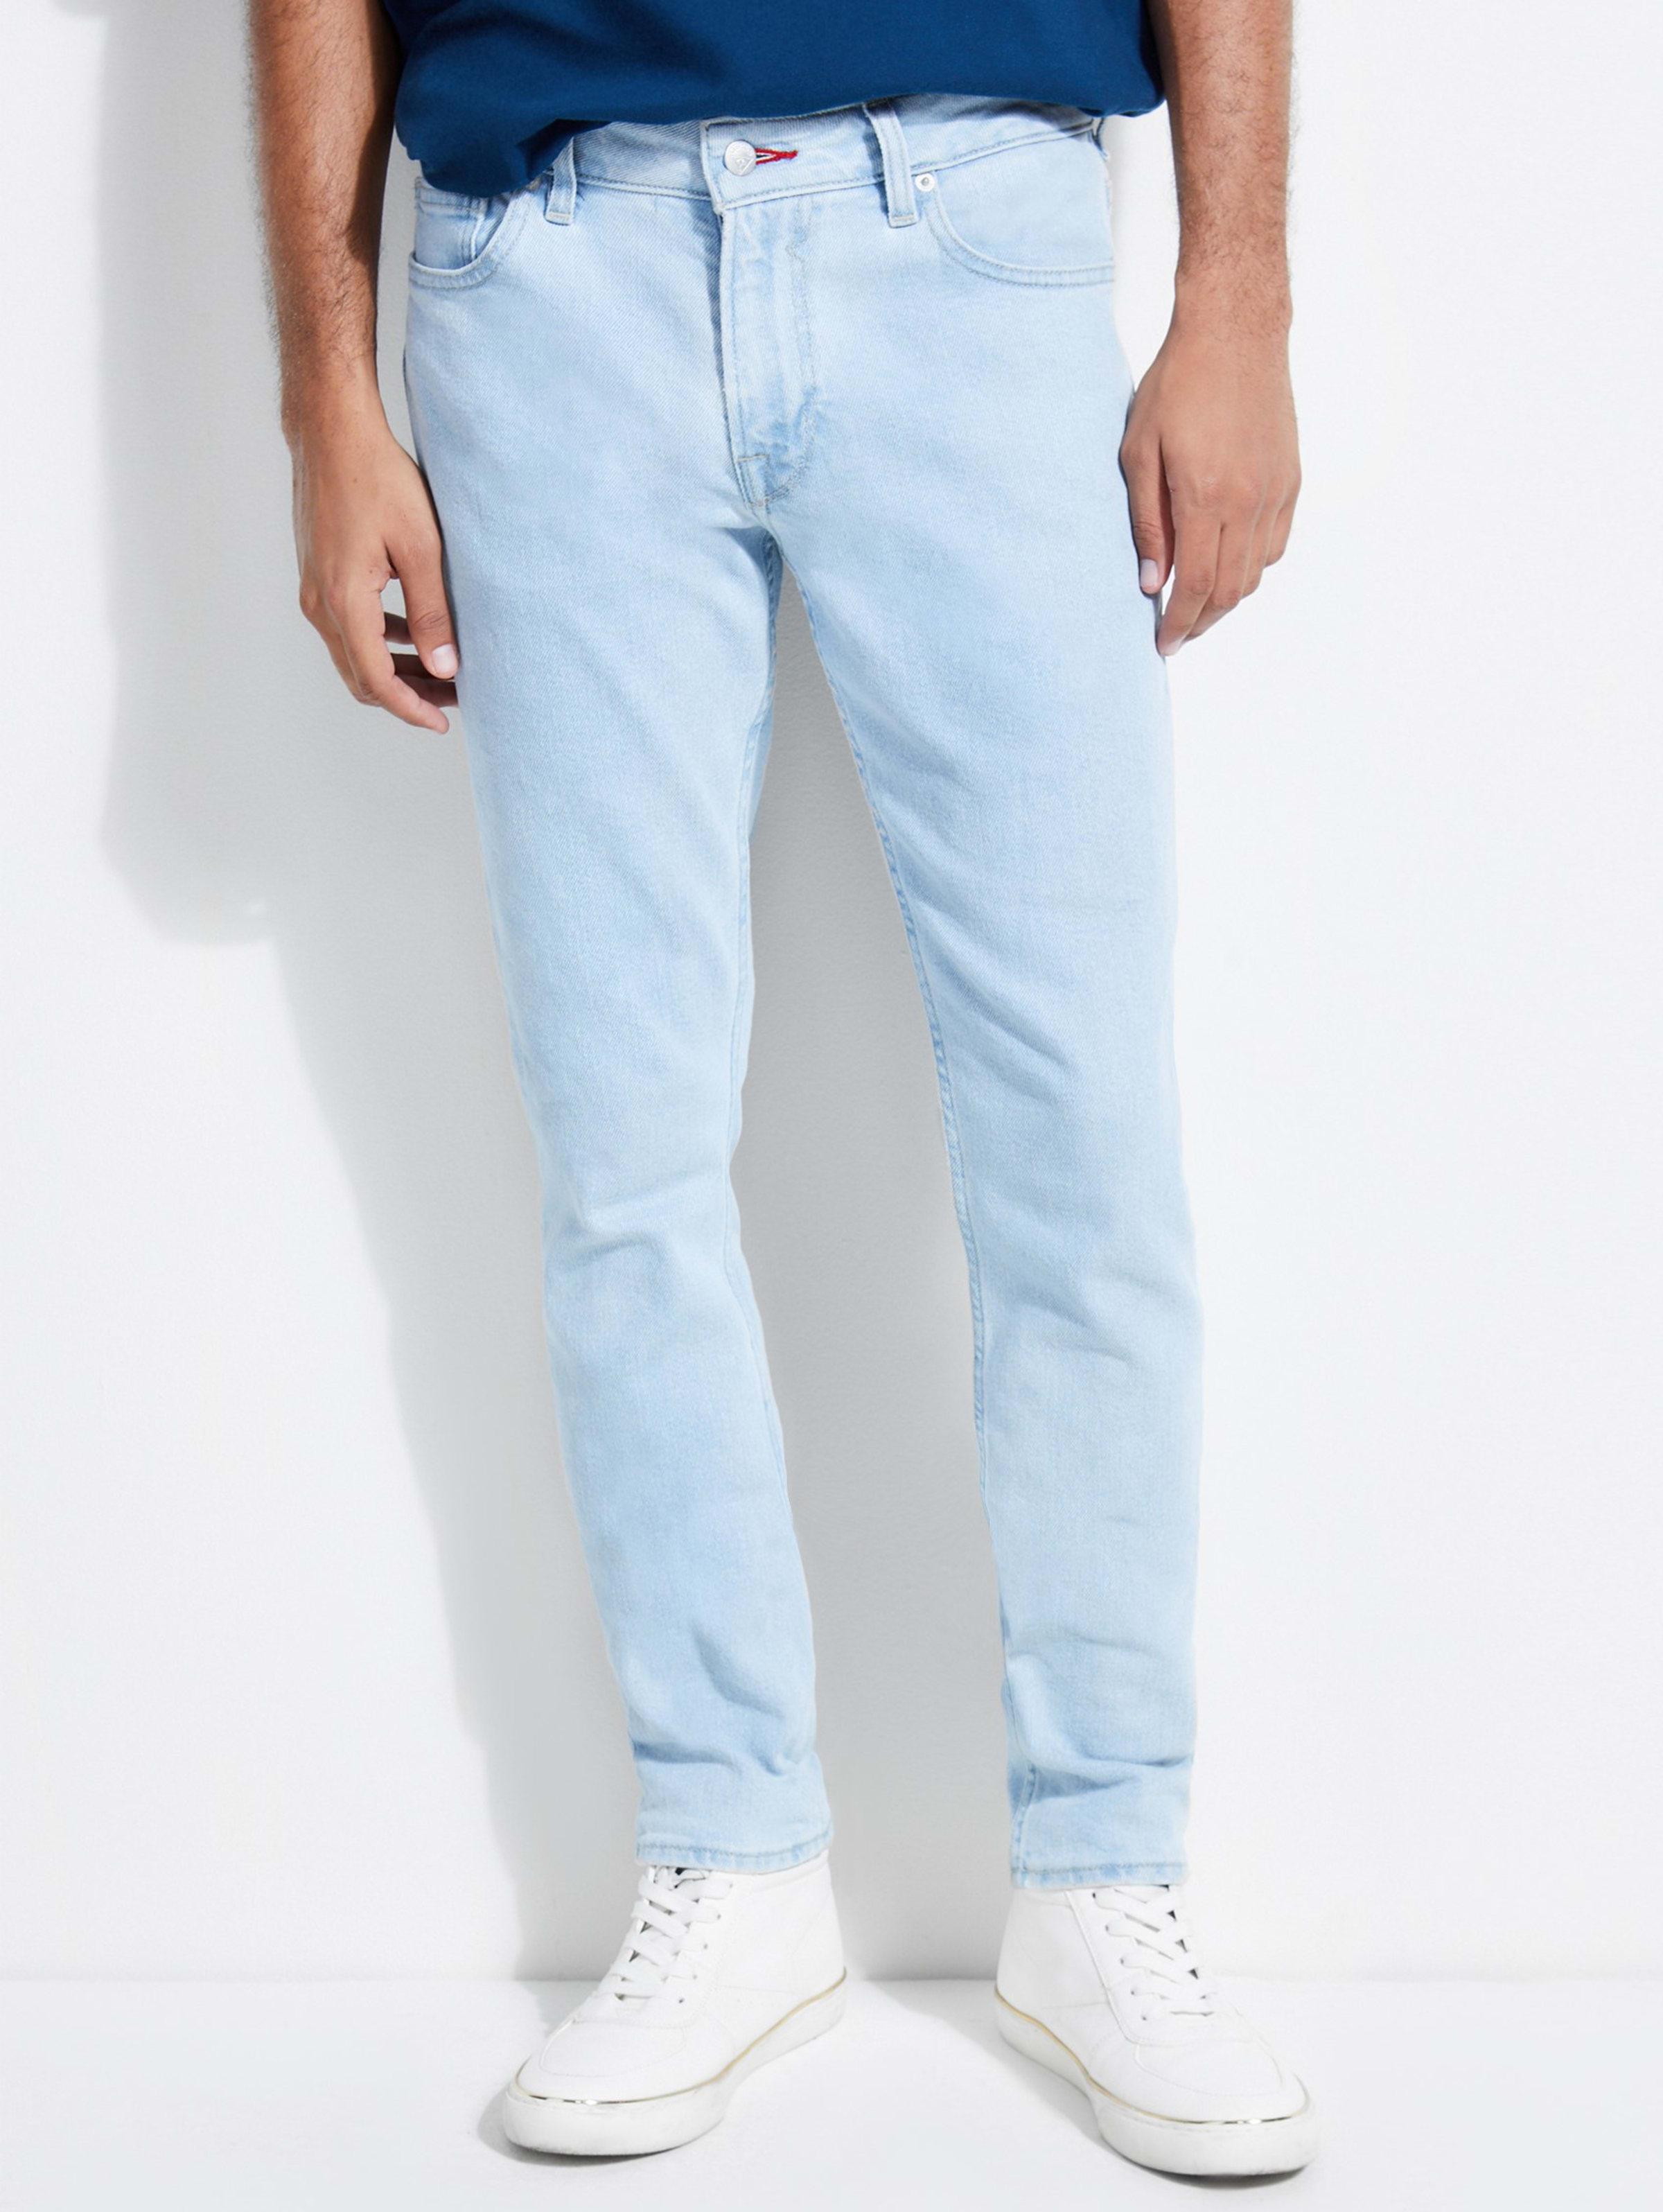 Guess Jeans Slim Straight Men/'s Size 32 X 34 Classic Blue Jeans Light Wash